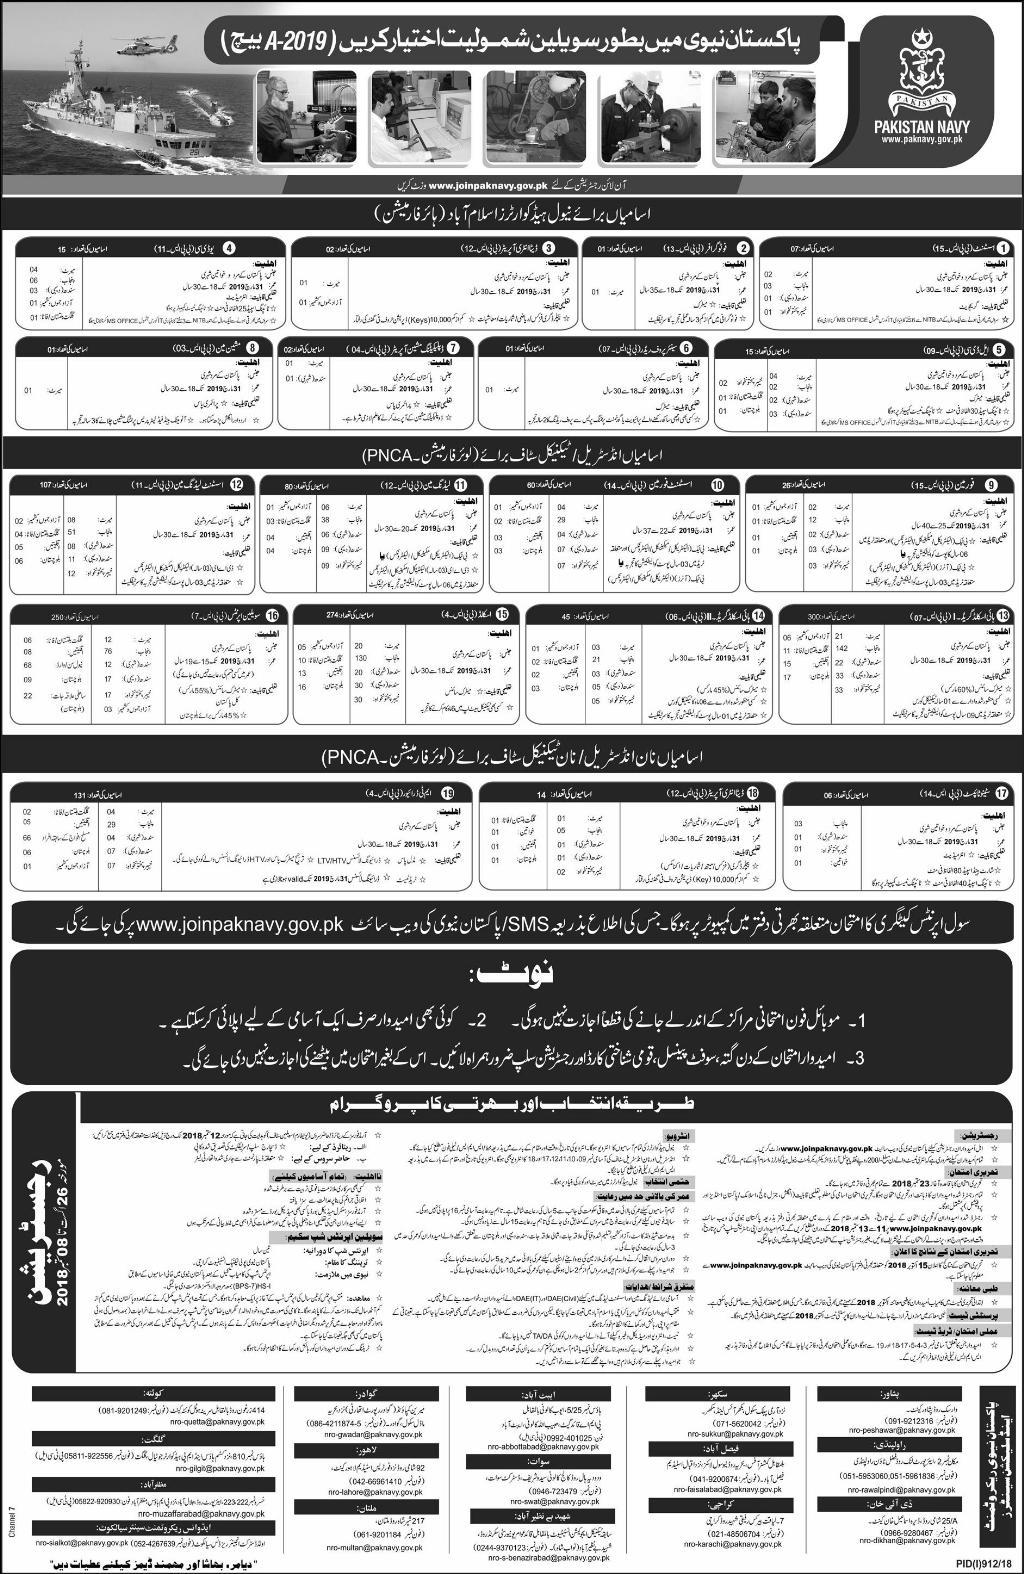 Pakistan Navy Civilian Jobs 2019 Online Registration Batch A